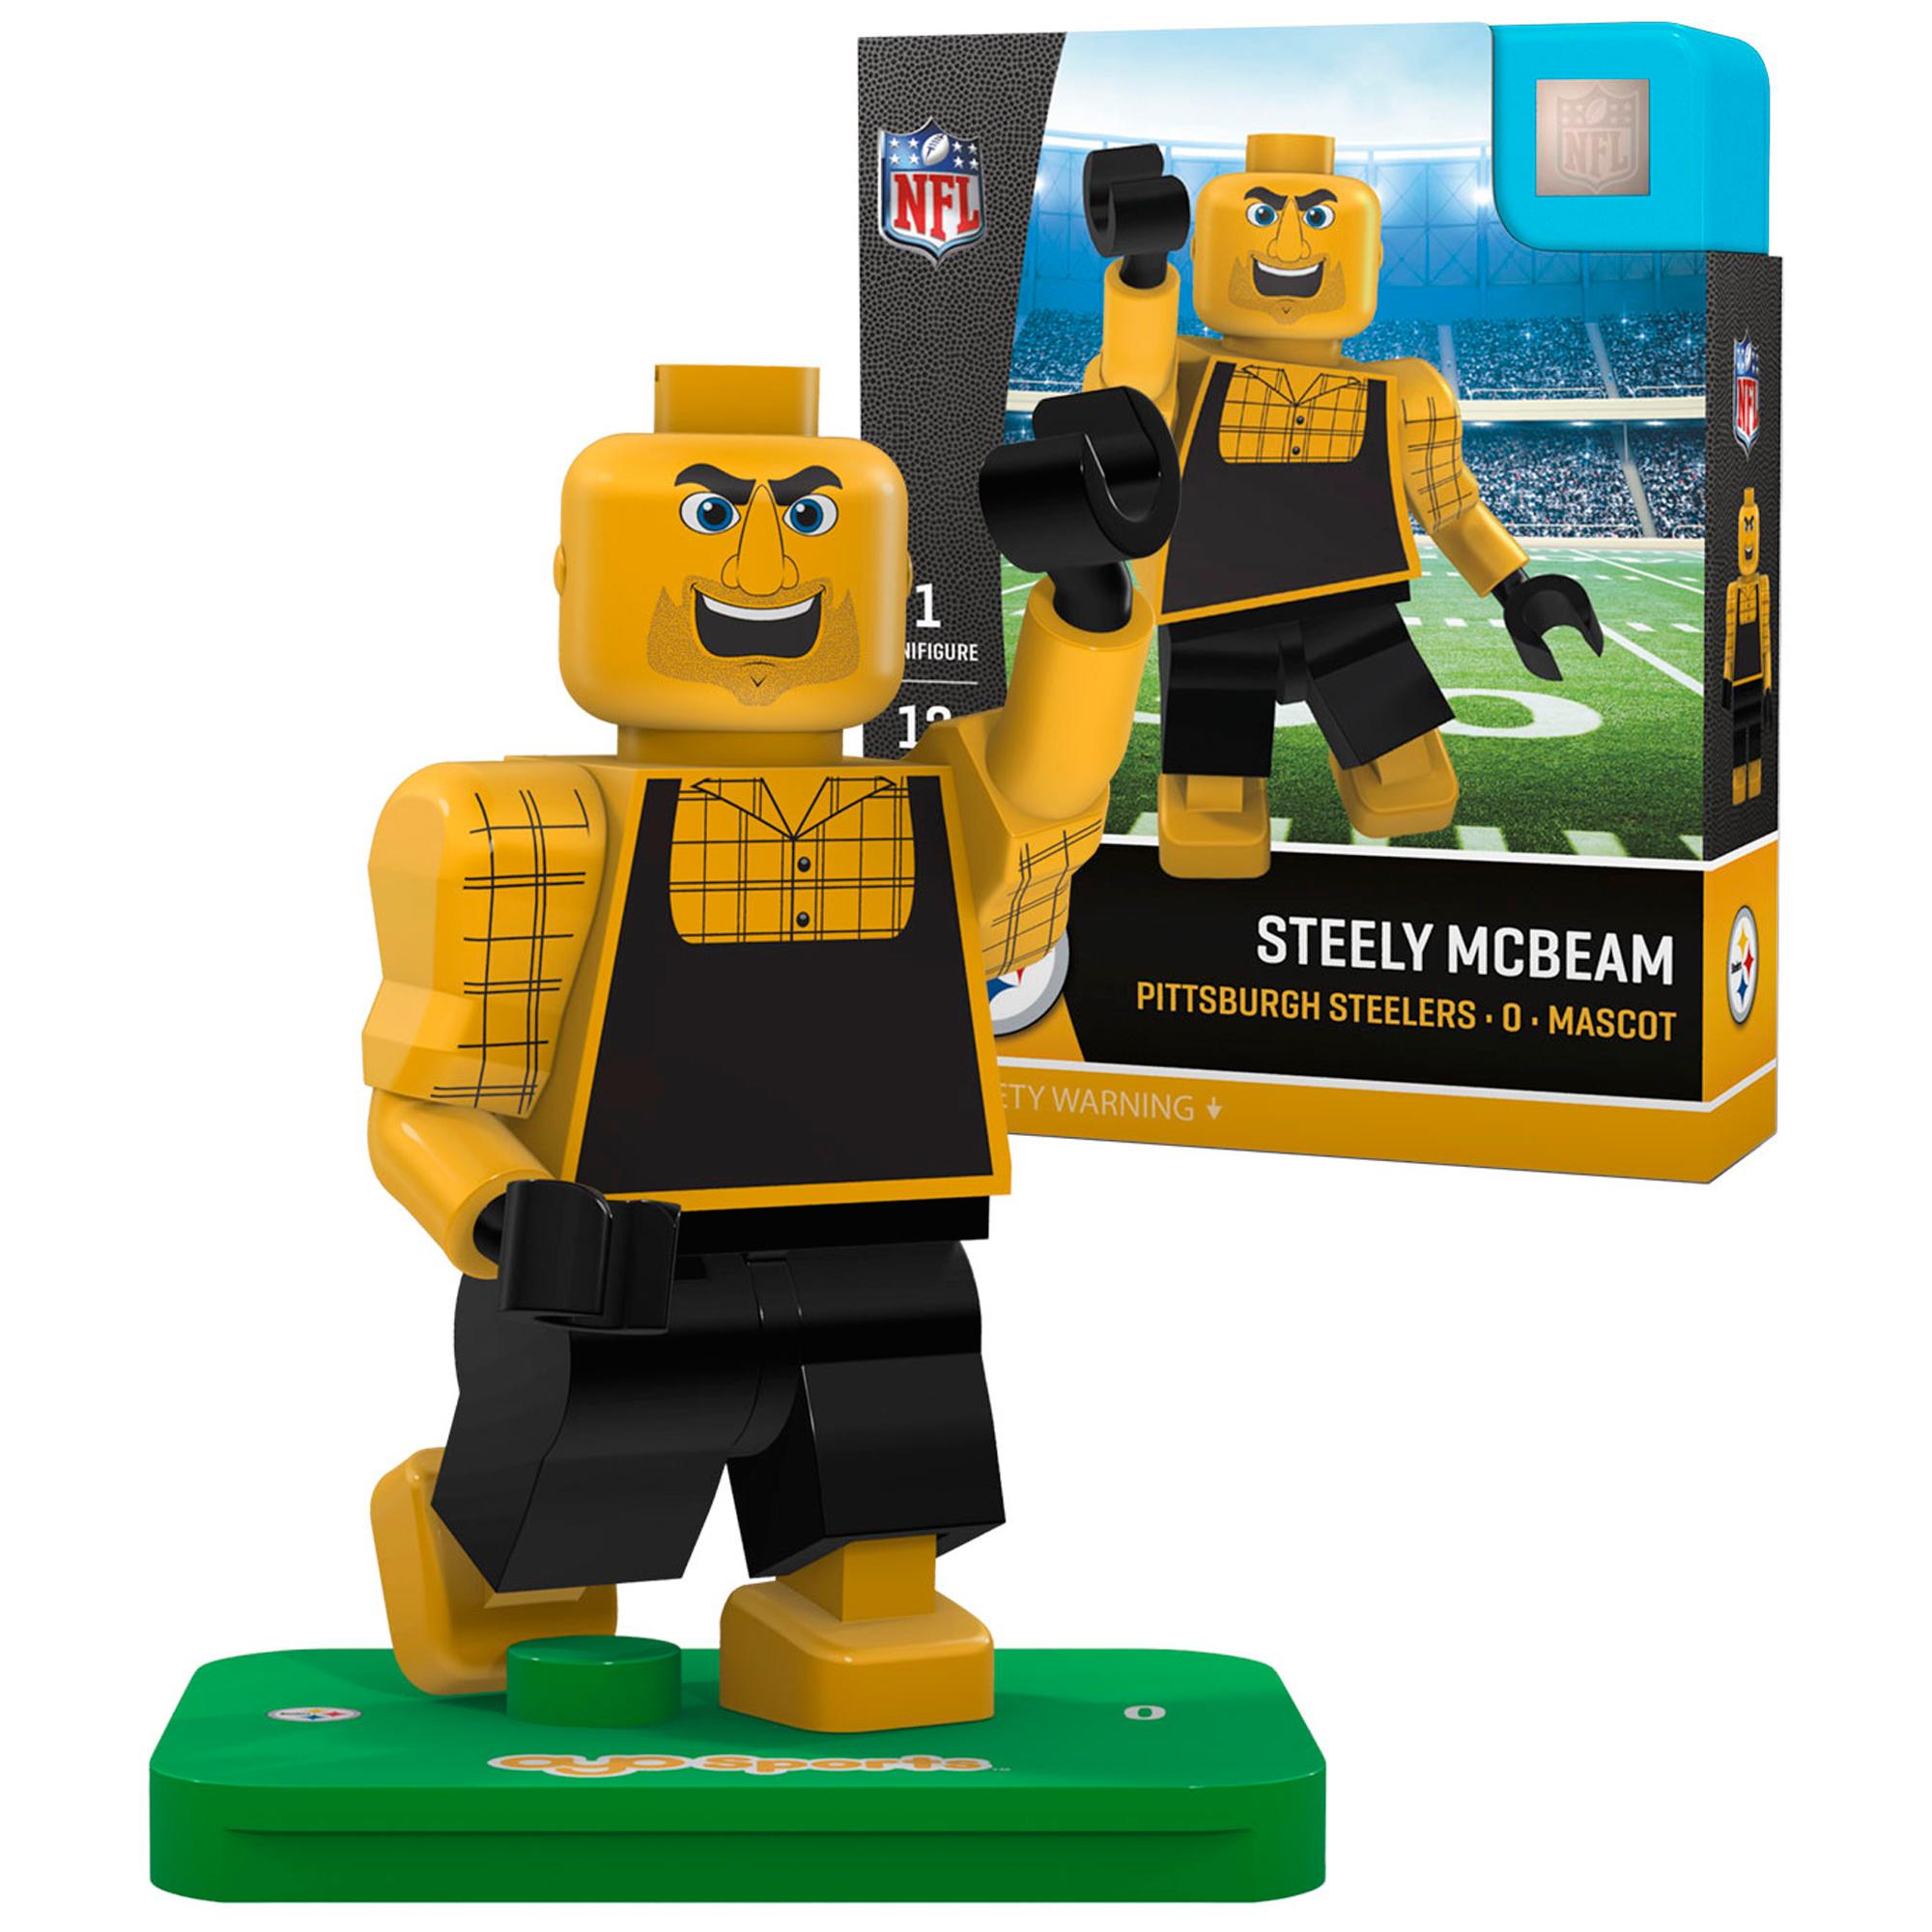 Steely McBeam Pittsburgh Steelers OYO Sports Generation 5 Mascot Minifigure - No Size